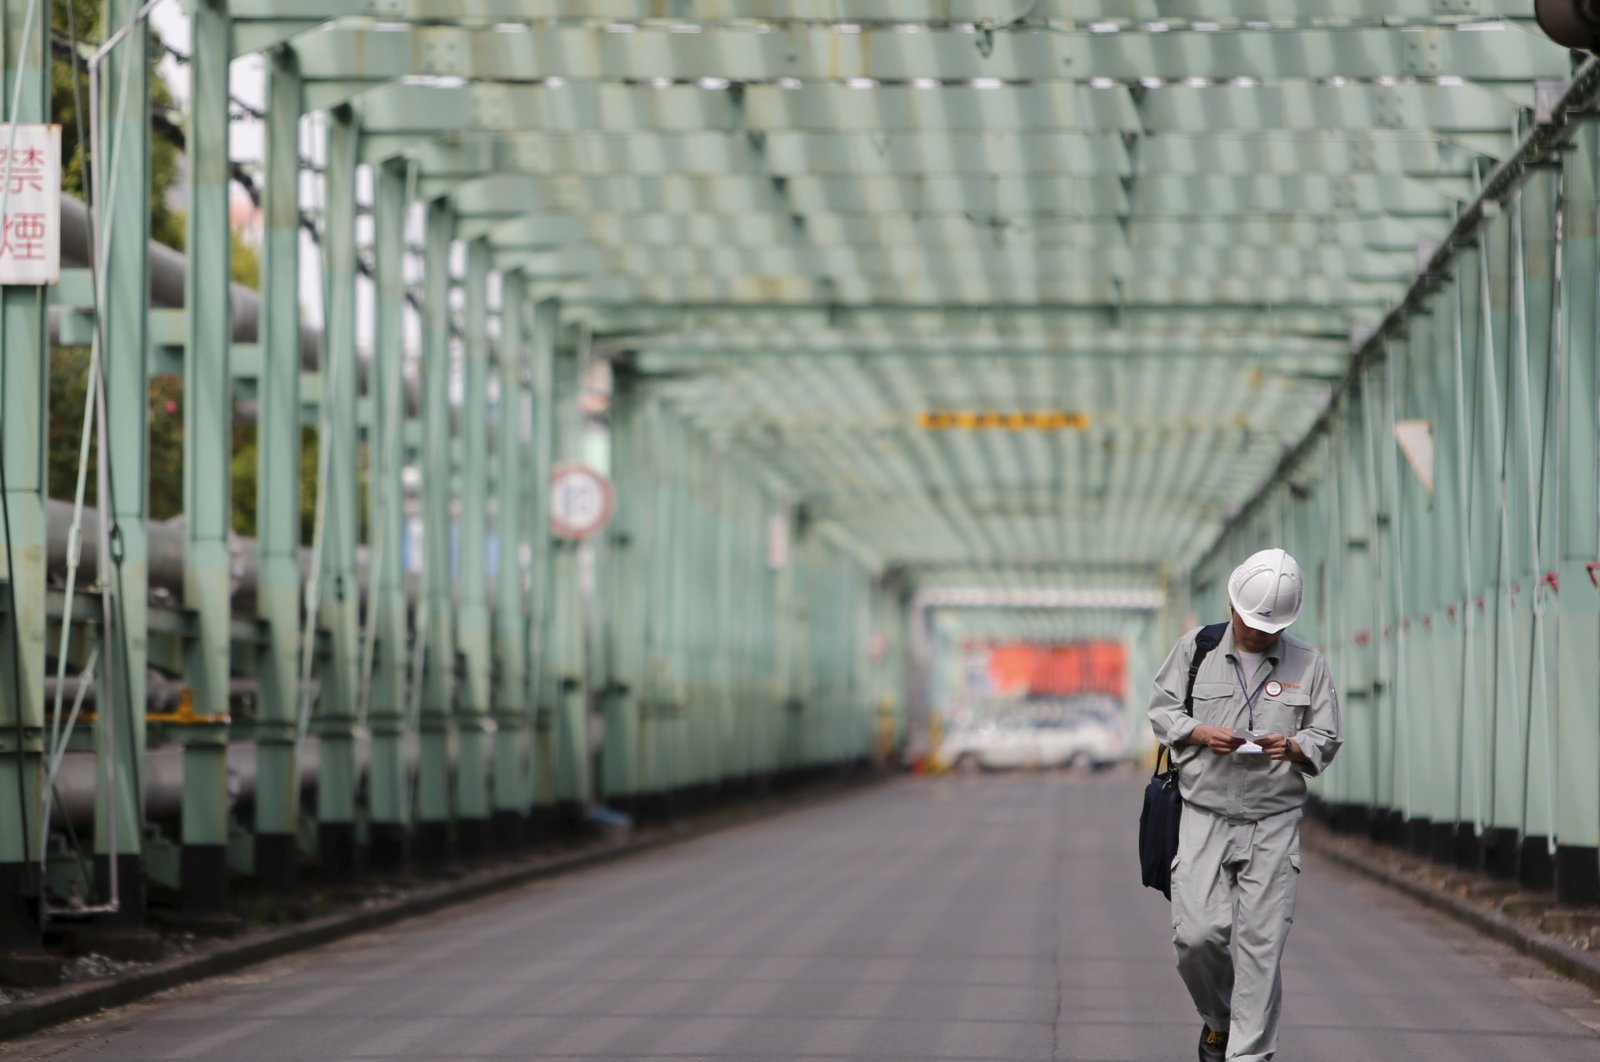 A man walks inside a factory at Keihin industrial zone in Kawasaki, south of Tokyo, Japan, June 28, 2013. (Reuters Photo)